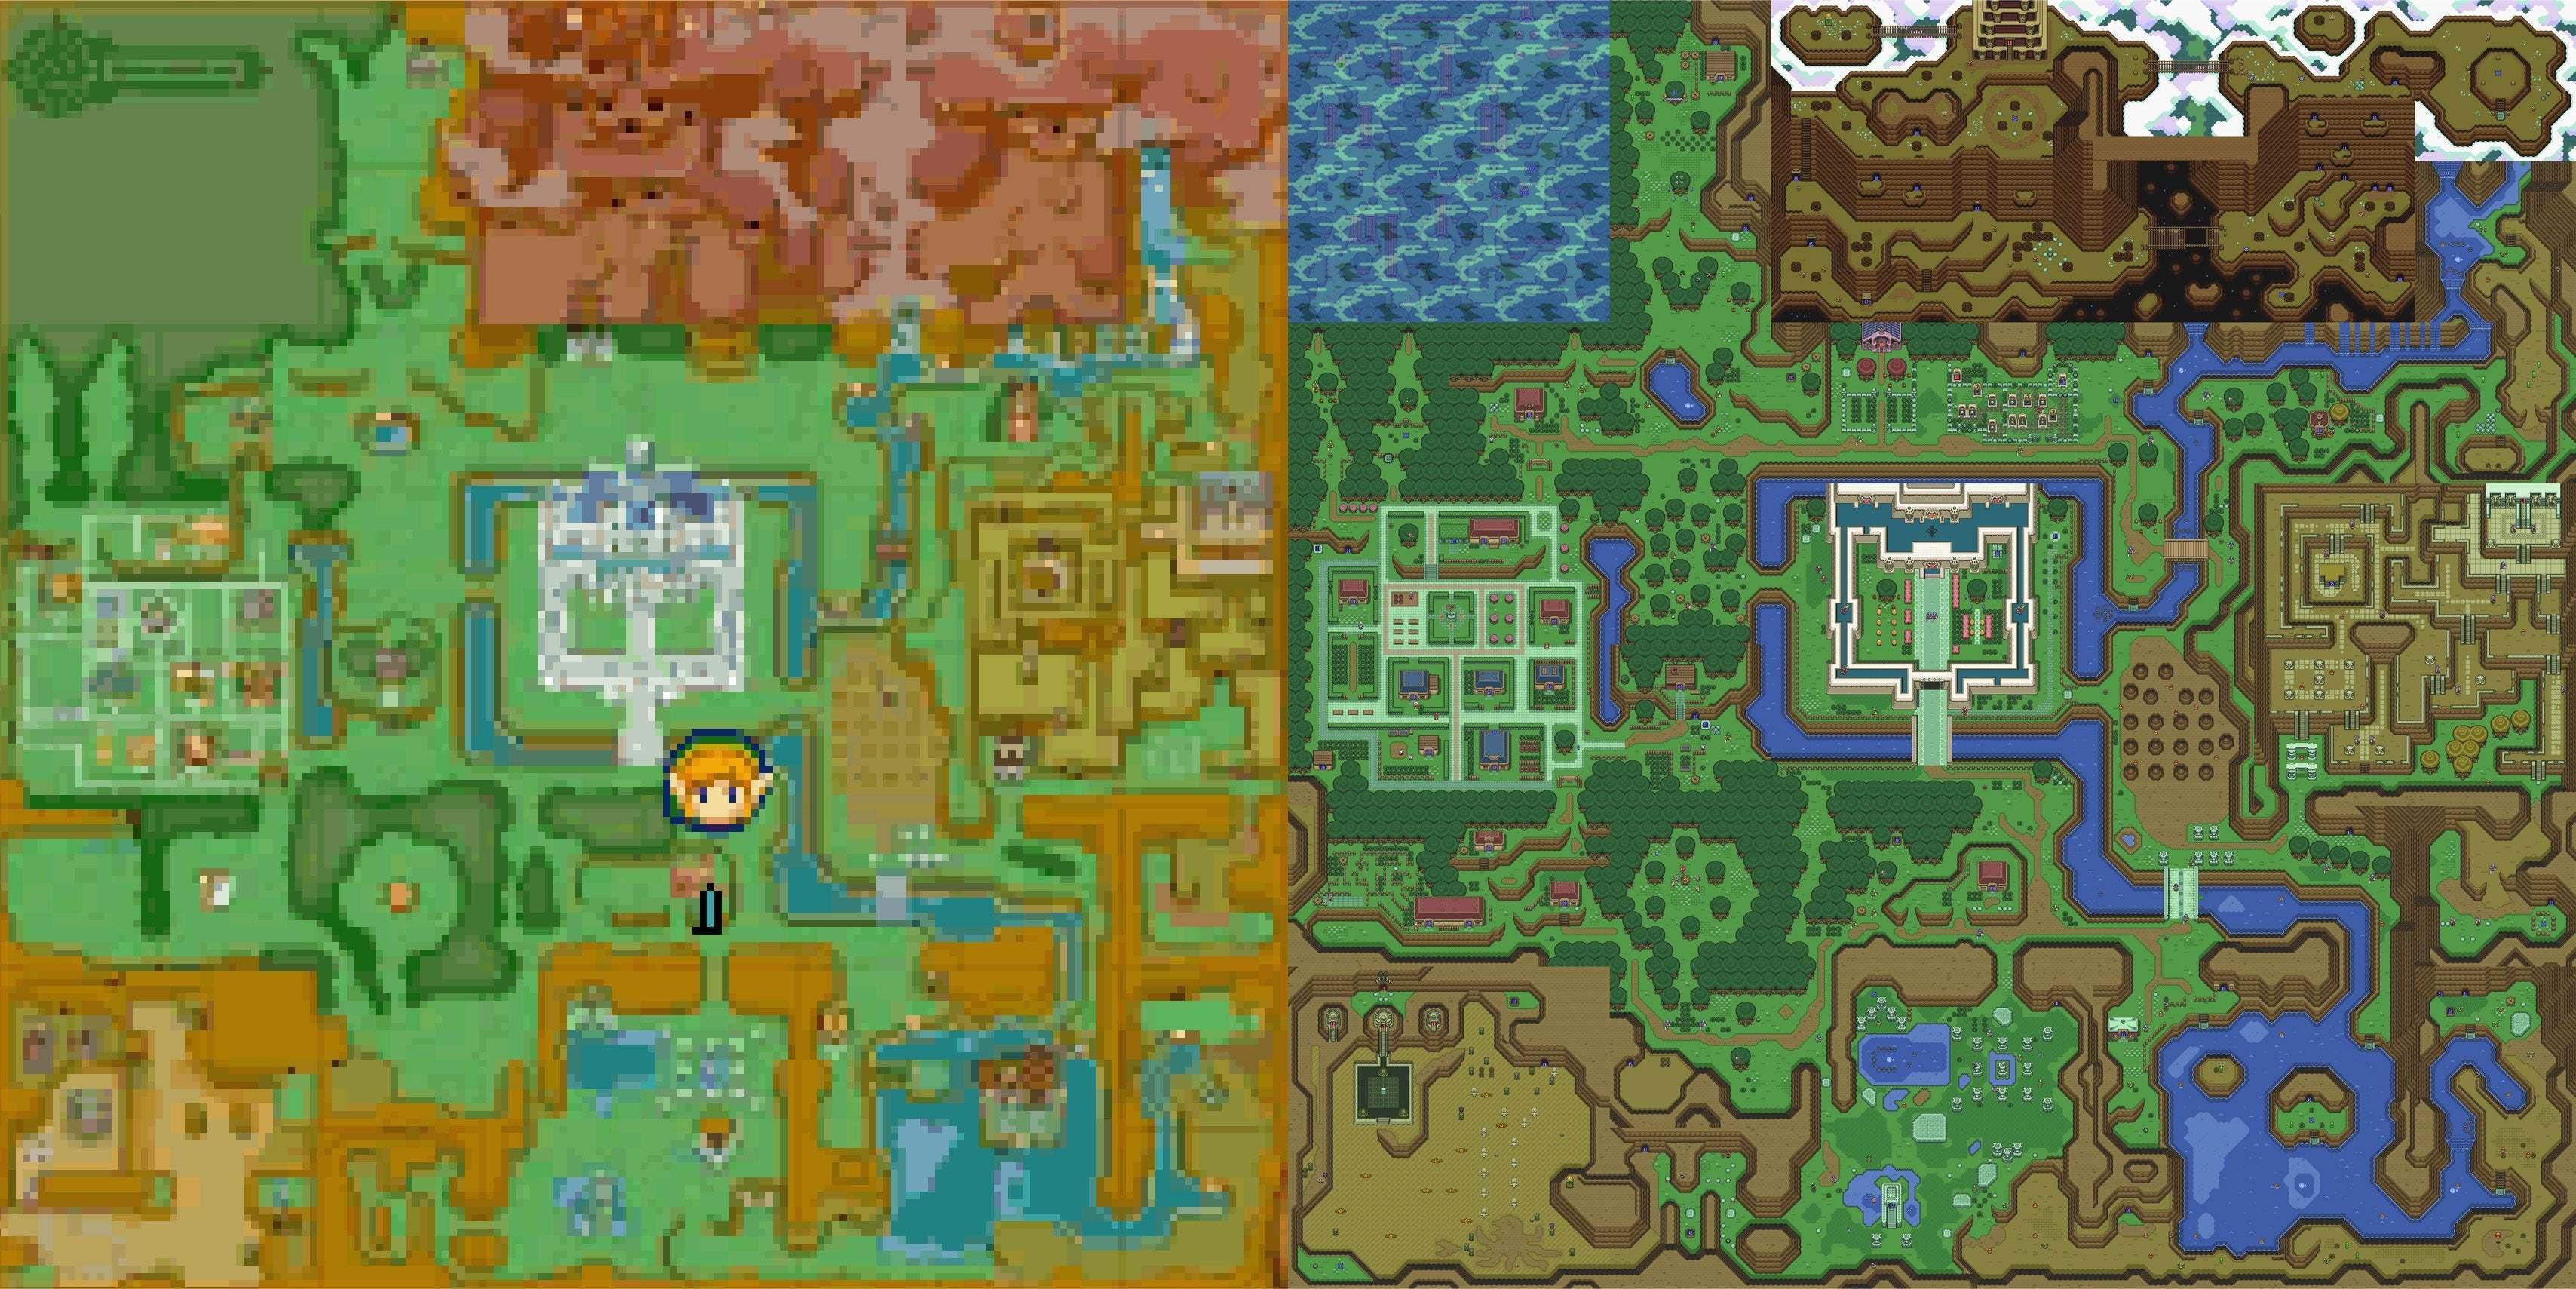 Overworld map from _A Link Between Worlds_